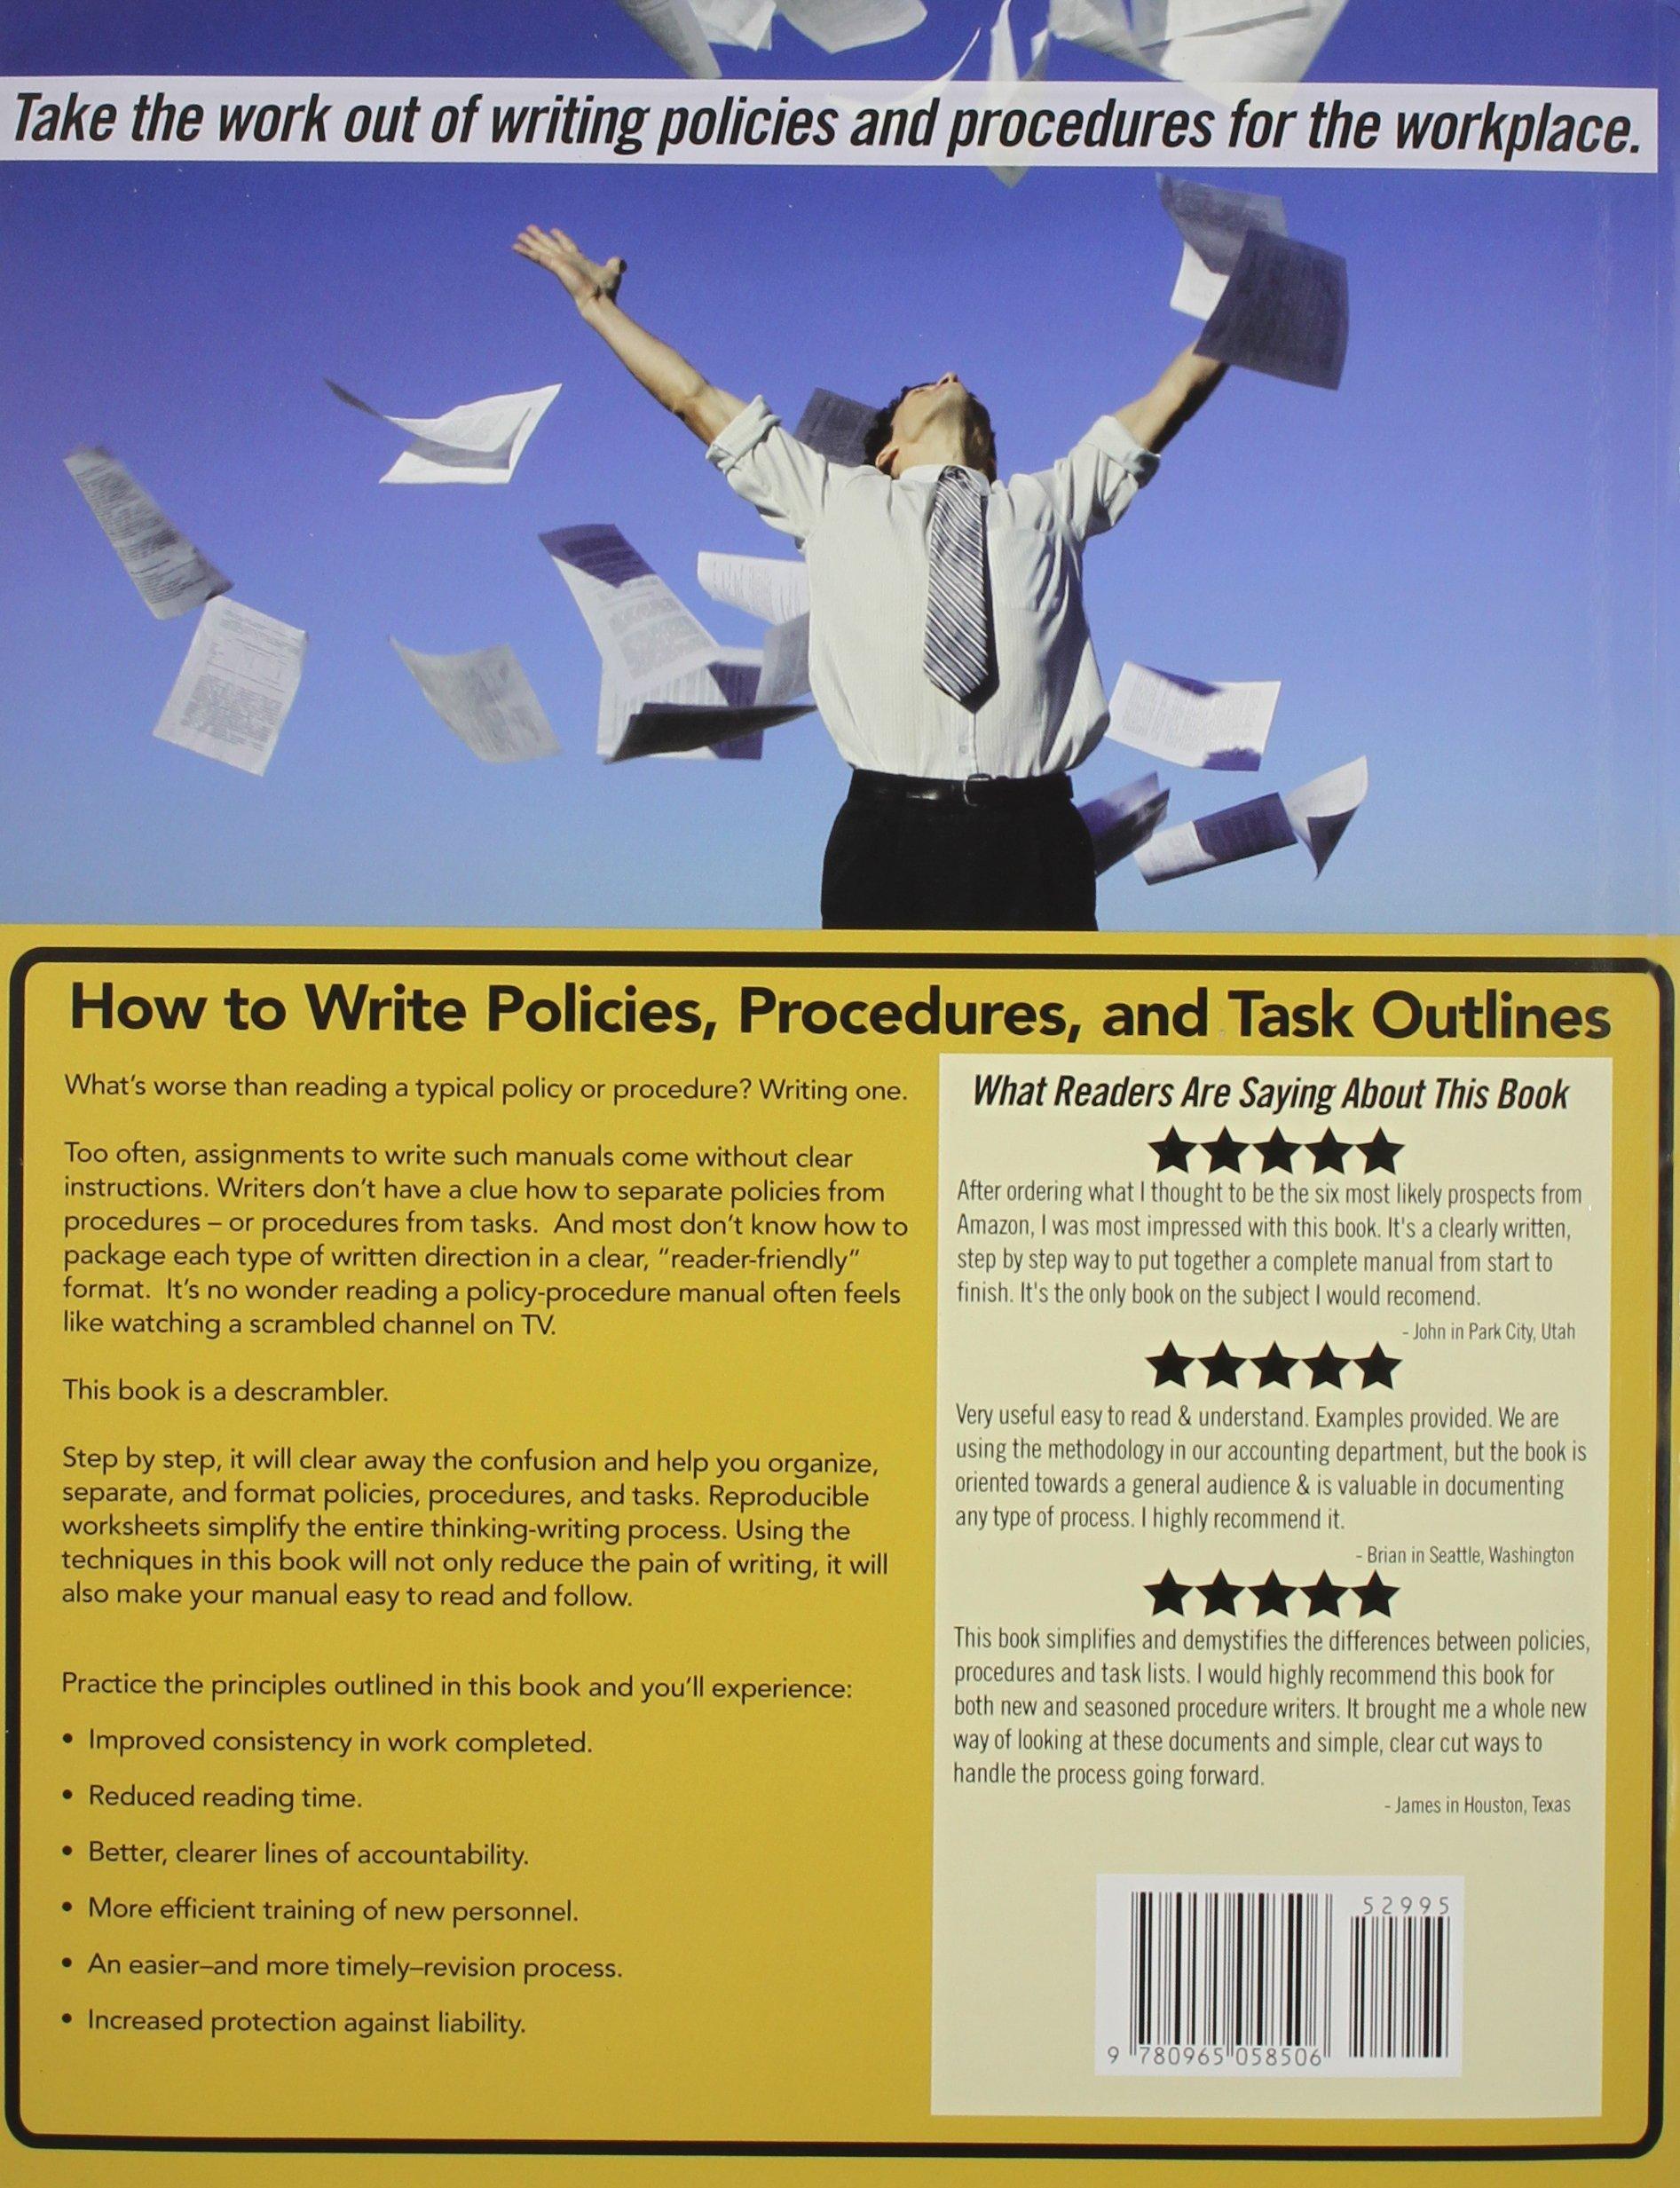 How to Write Policies, Procedures & Task Outlines: Sending